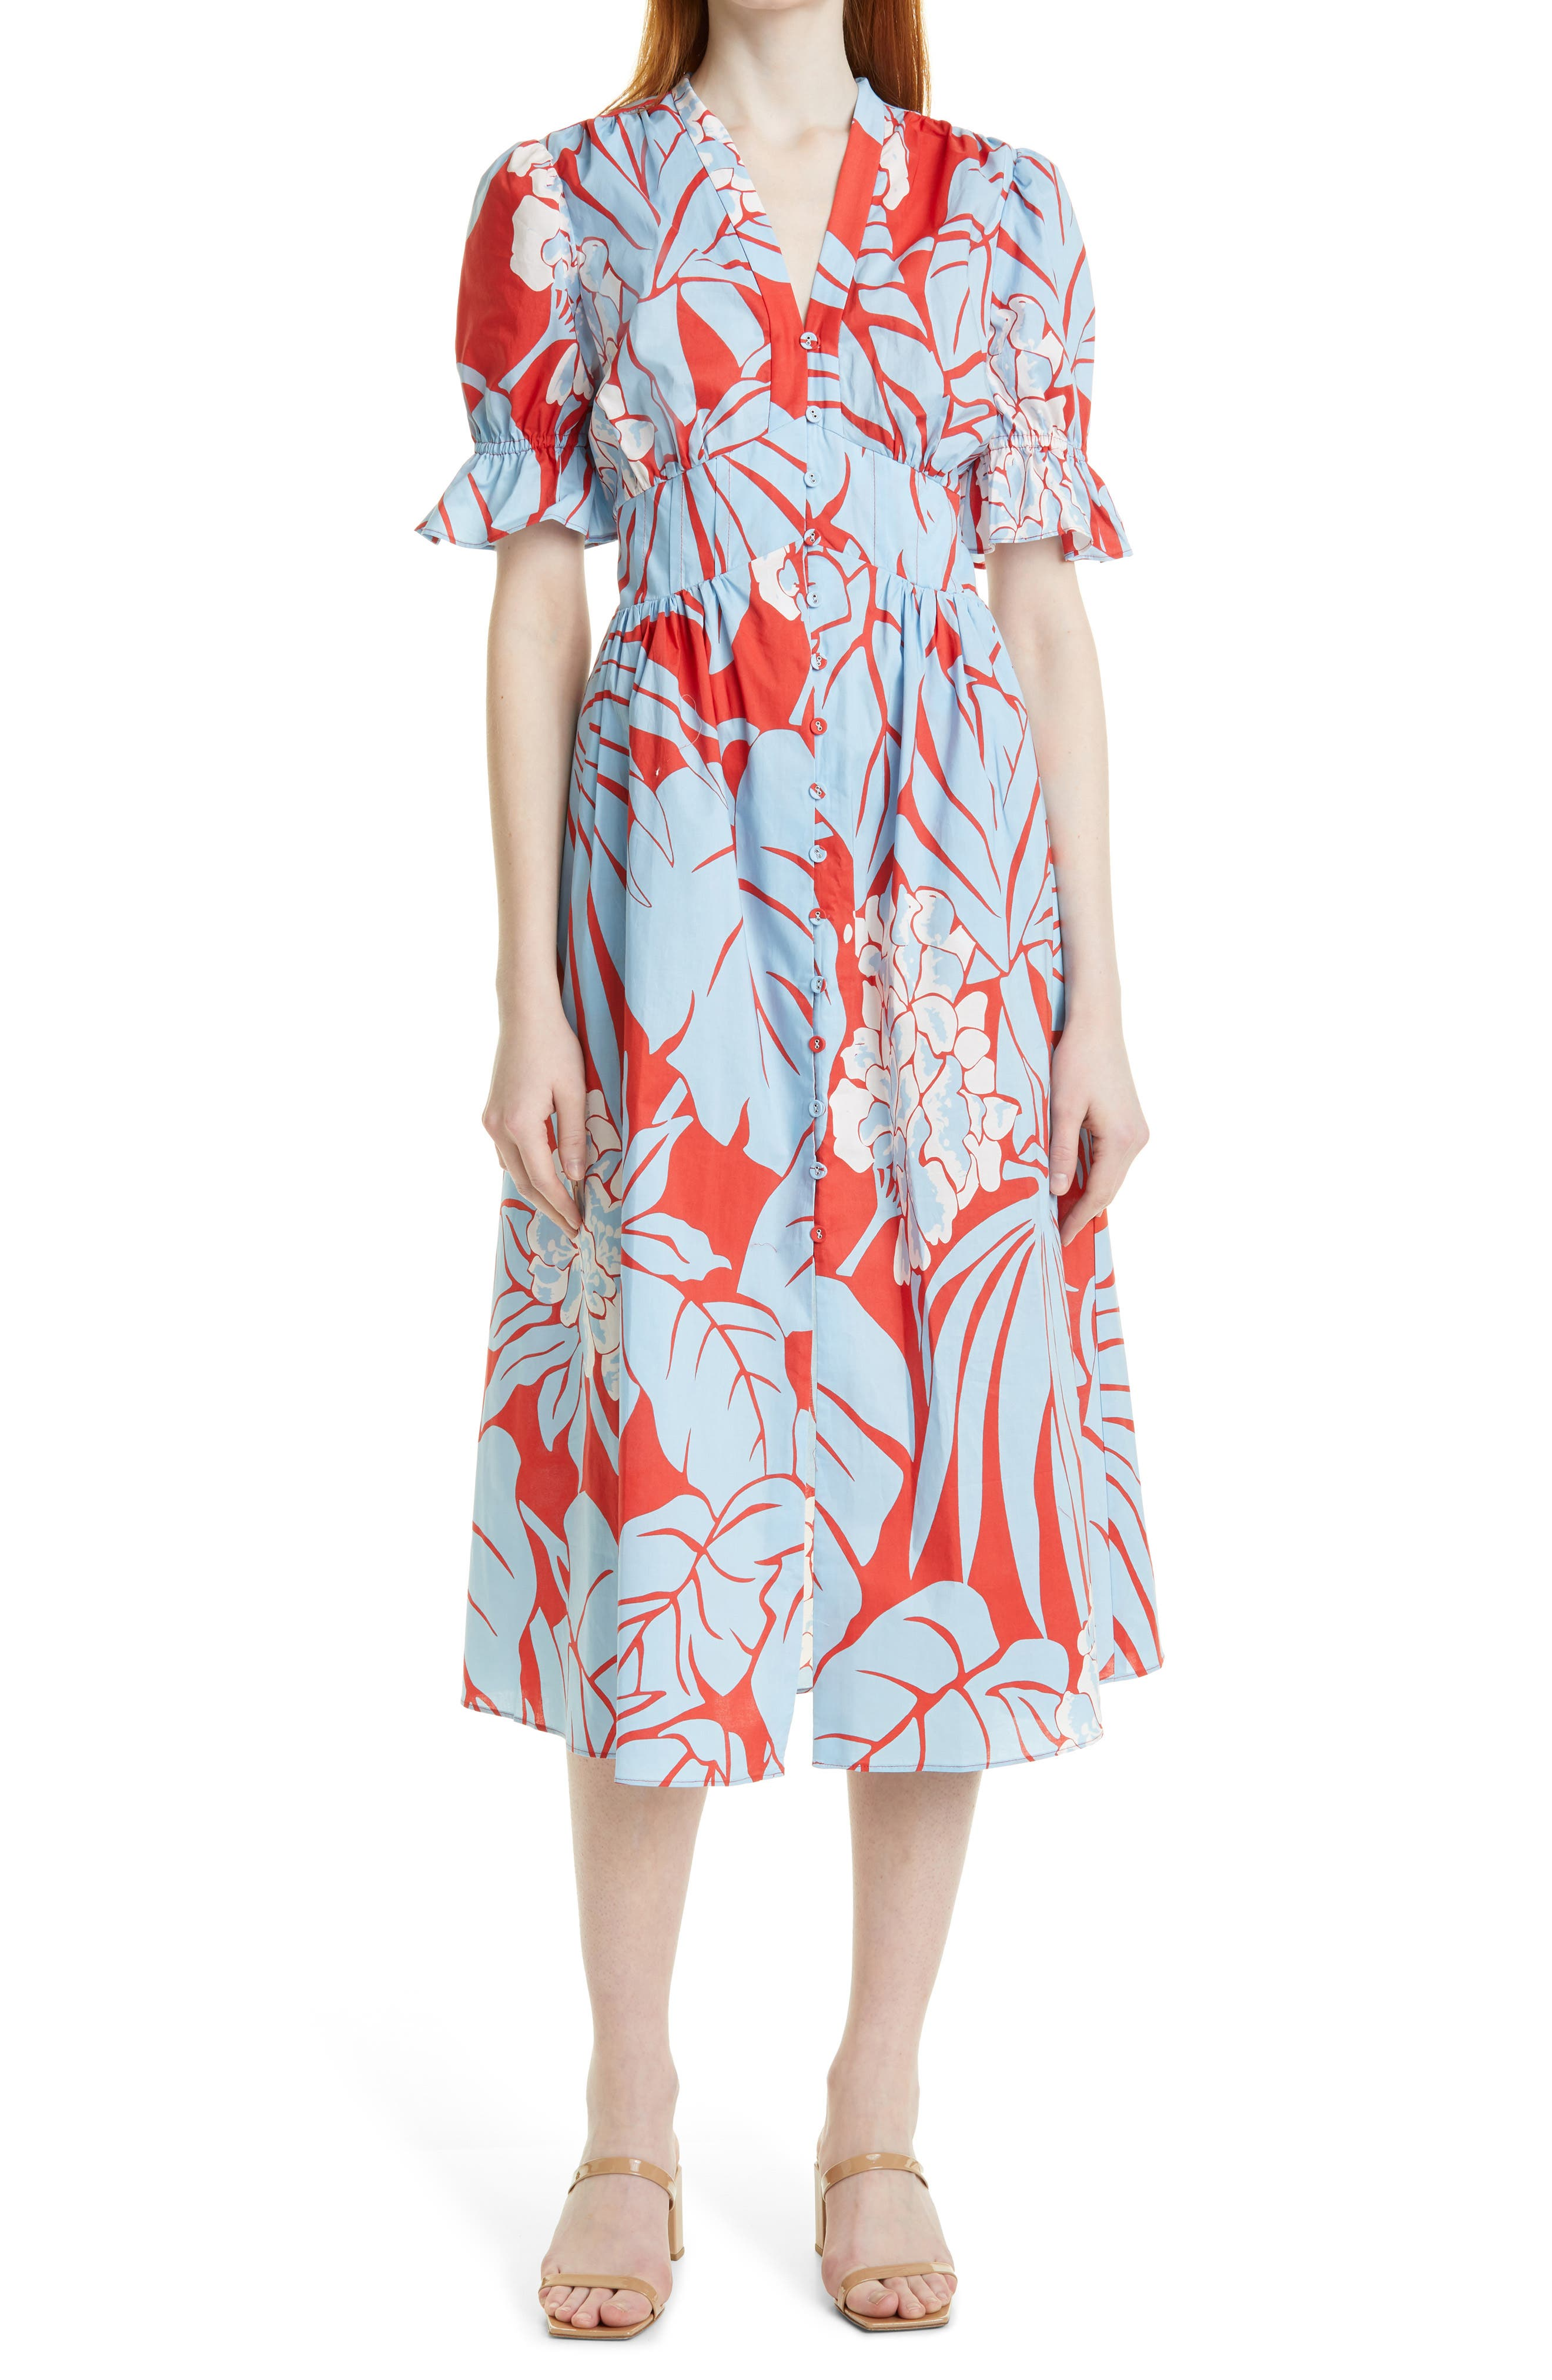 Erica Floral Short Sleeve Cotton Dress